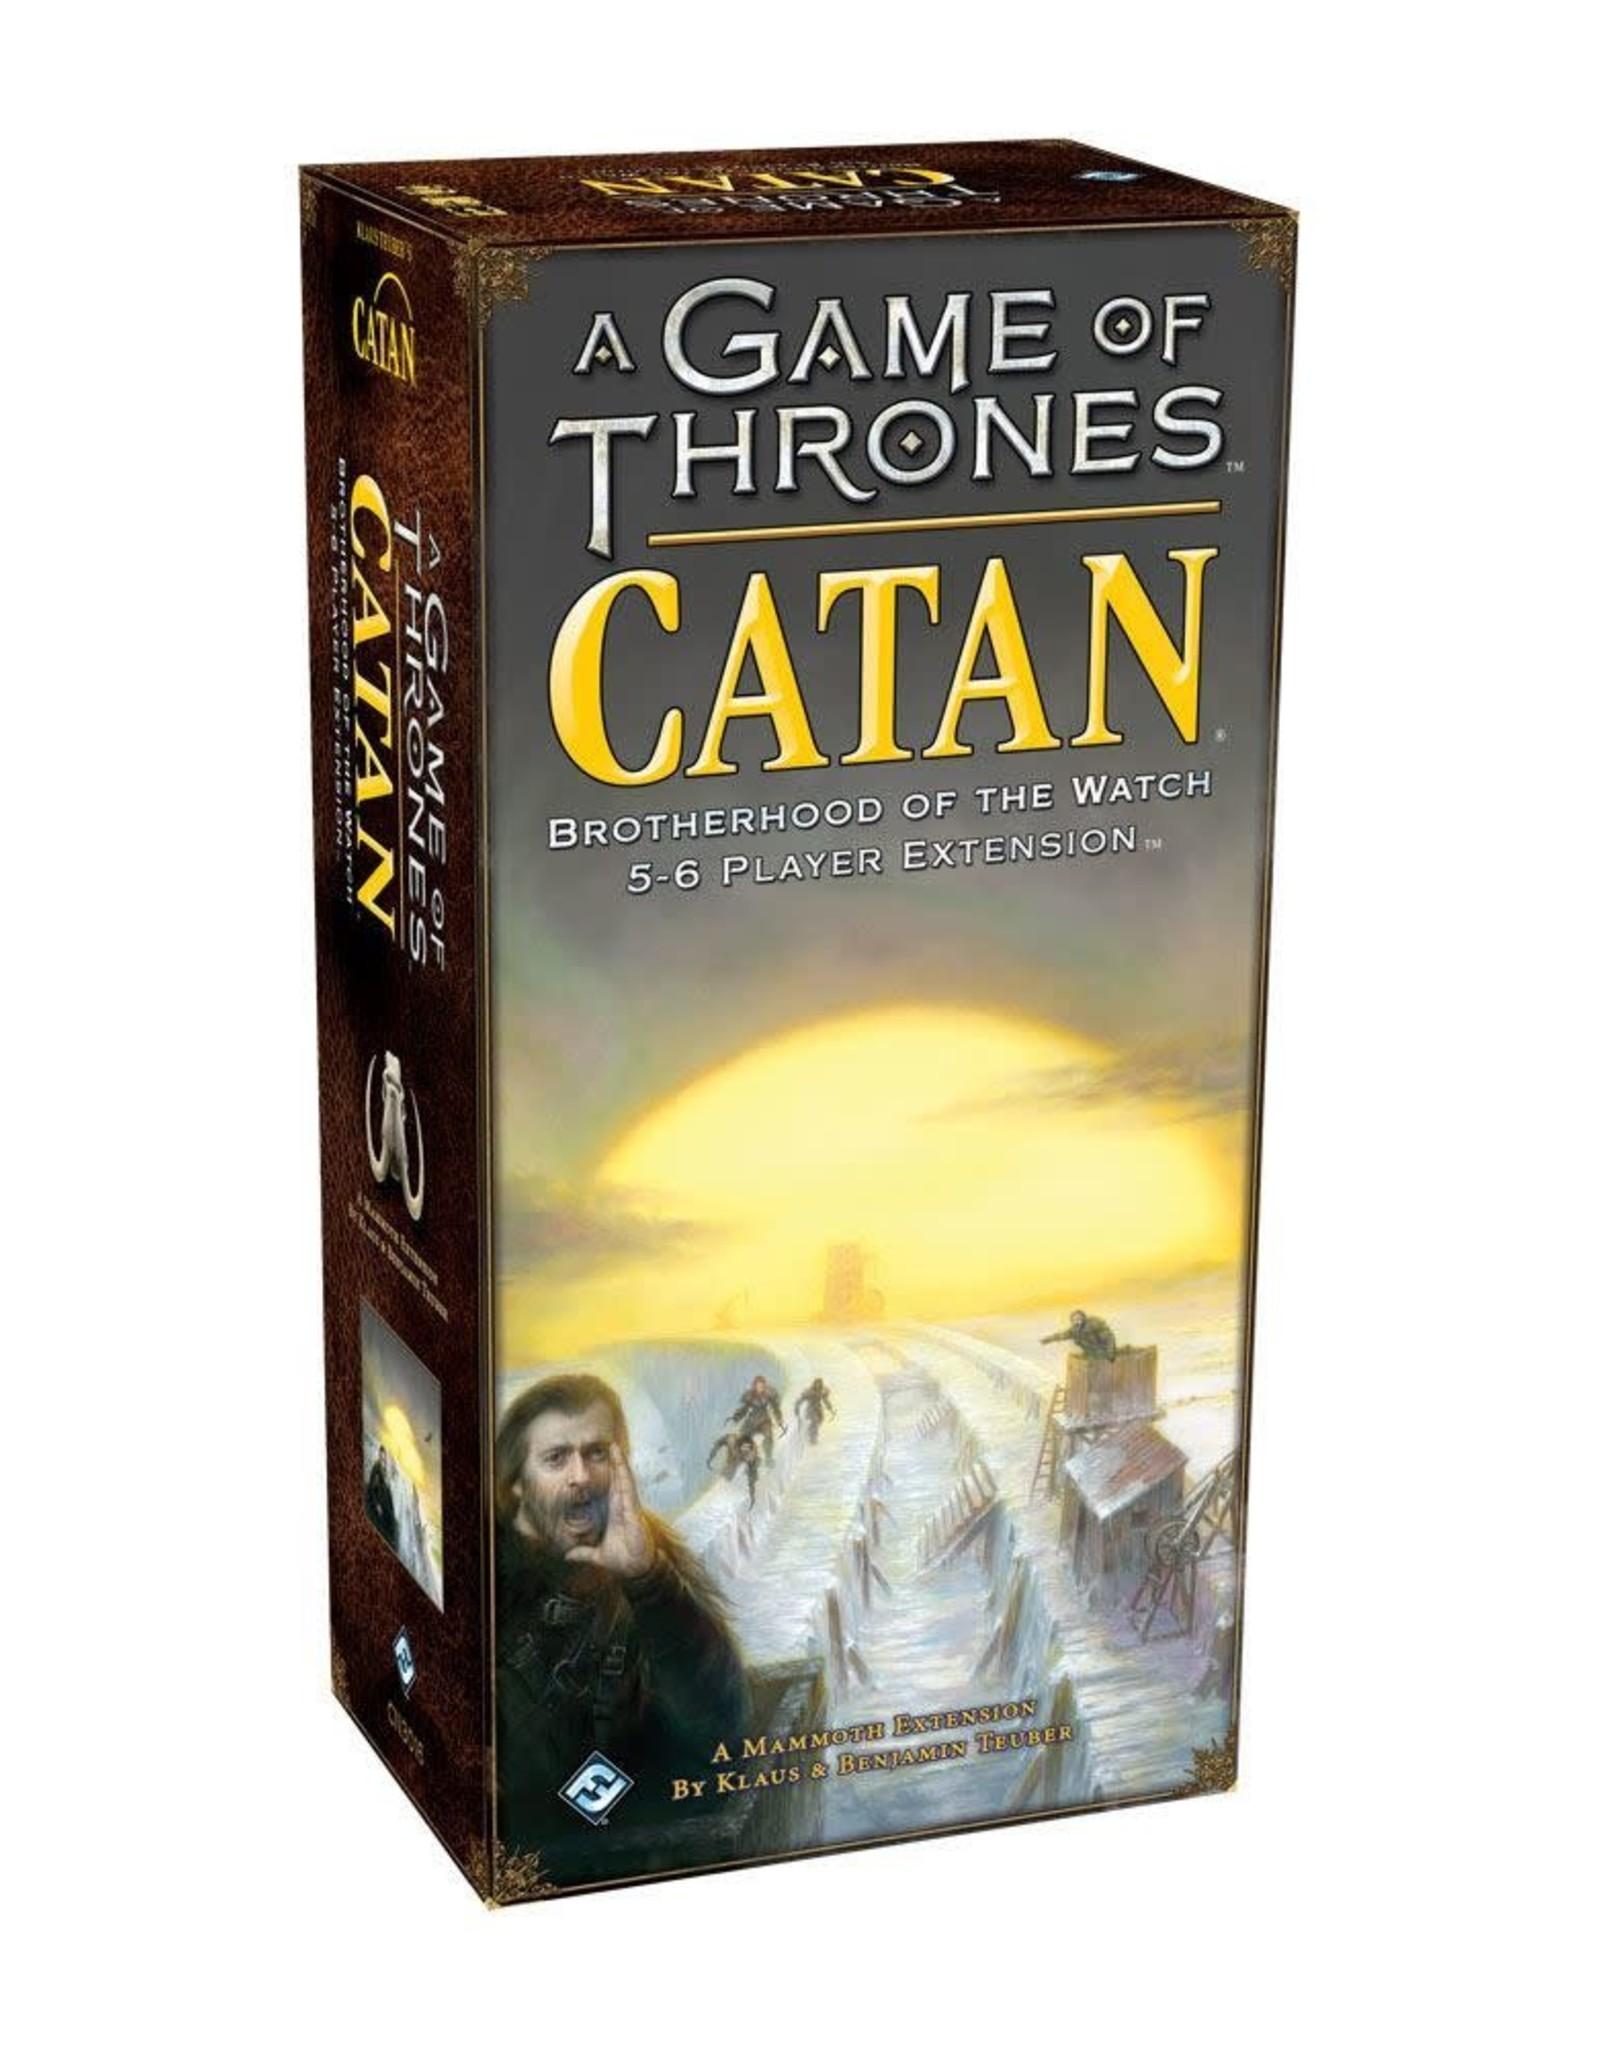 Catan Studio Catan A Game of Thrones Brotherhood Exp